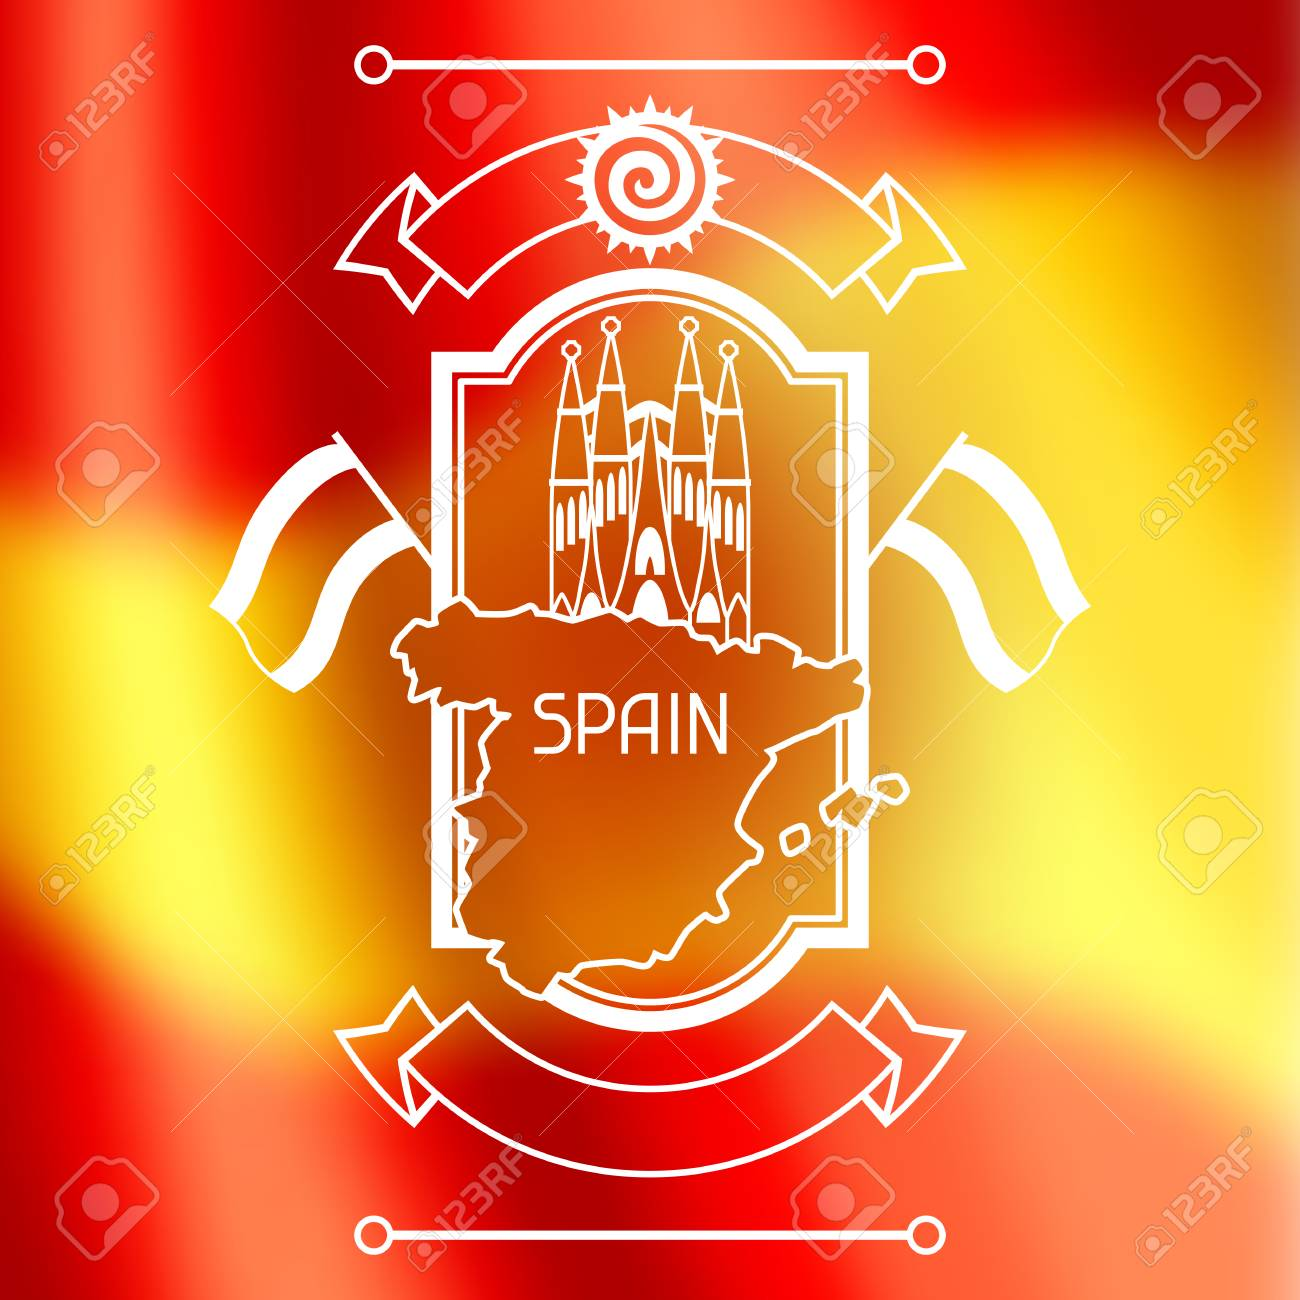 Spain background design on blurred flag spanish traditional spain background design on blurred flag spanish traditional symbols and objects stock vector voltagebd Gallery